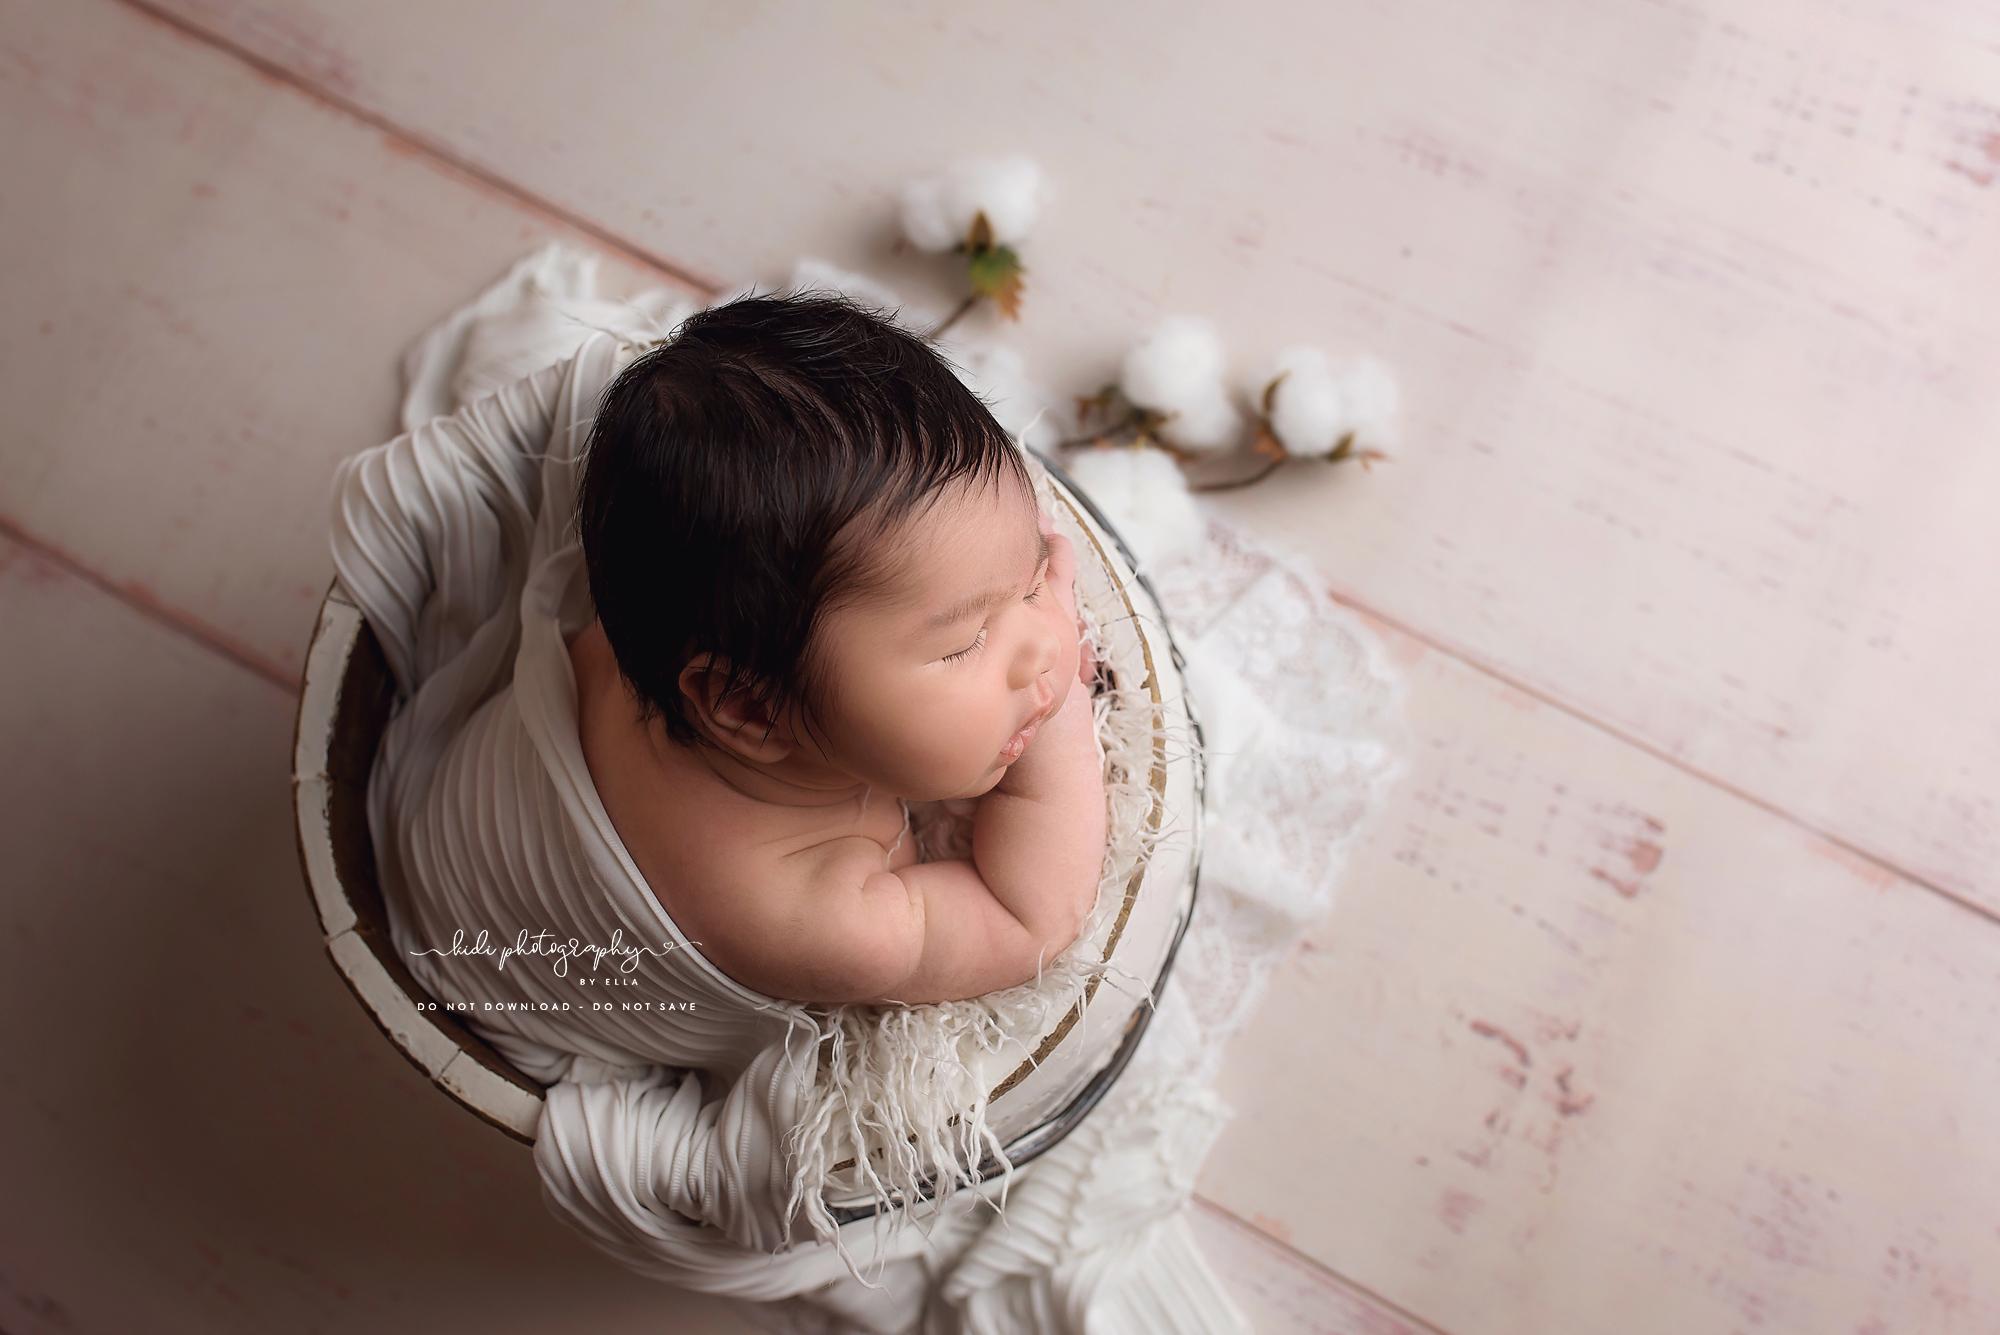 Kidi Photography by Ella